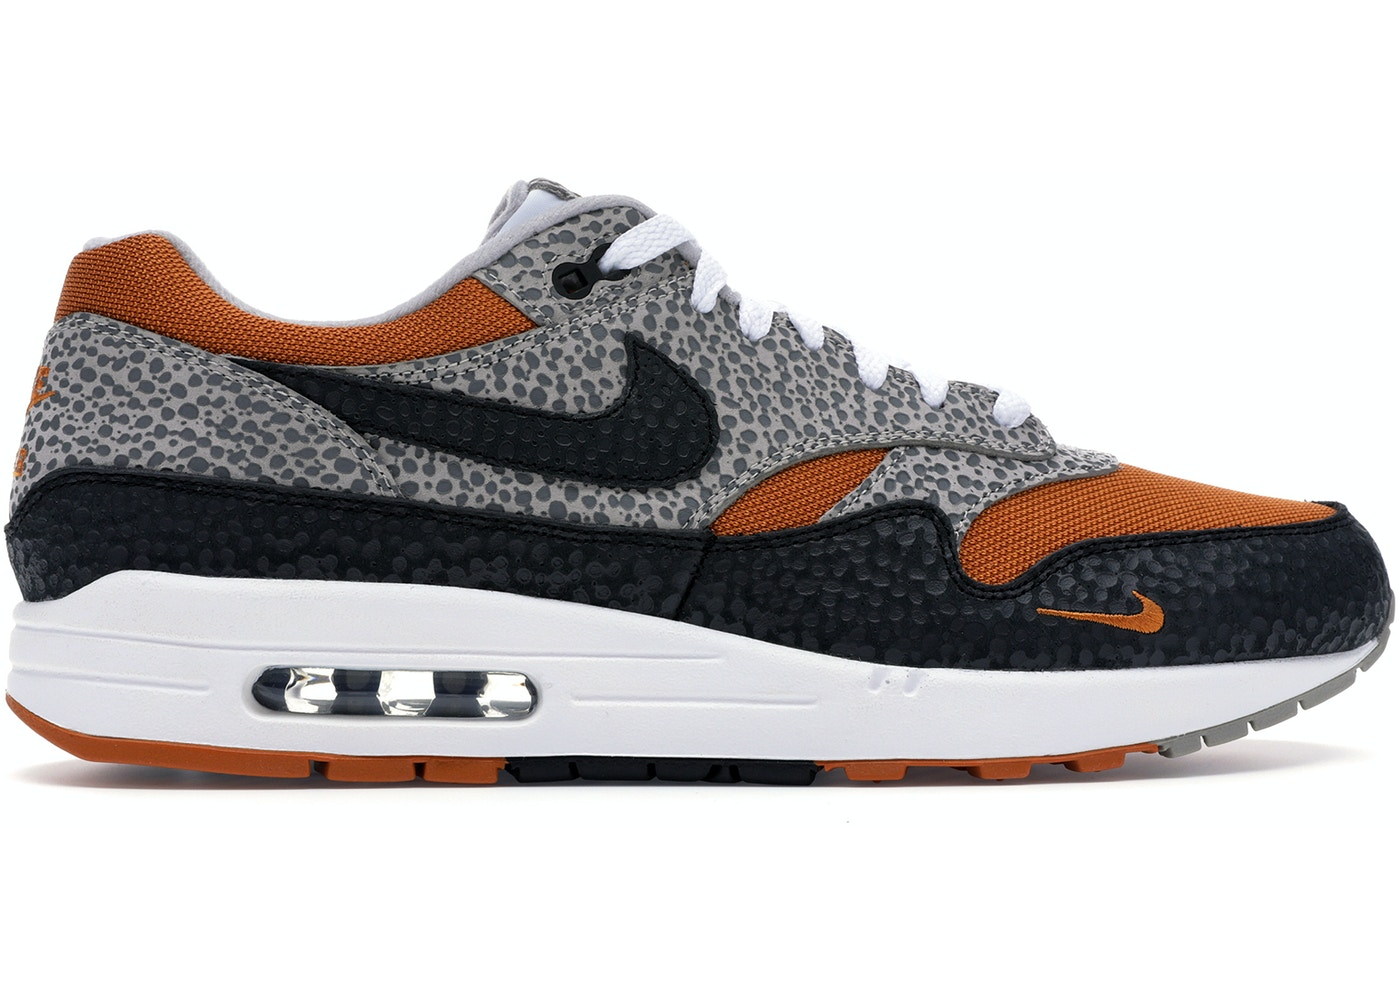 on sale 8531e d1d2e Nike Air Max 1 Shoes - Price Premium